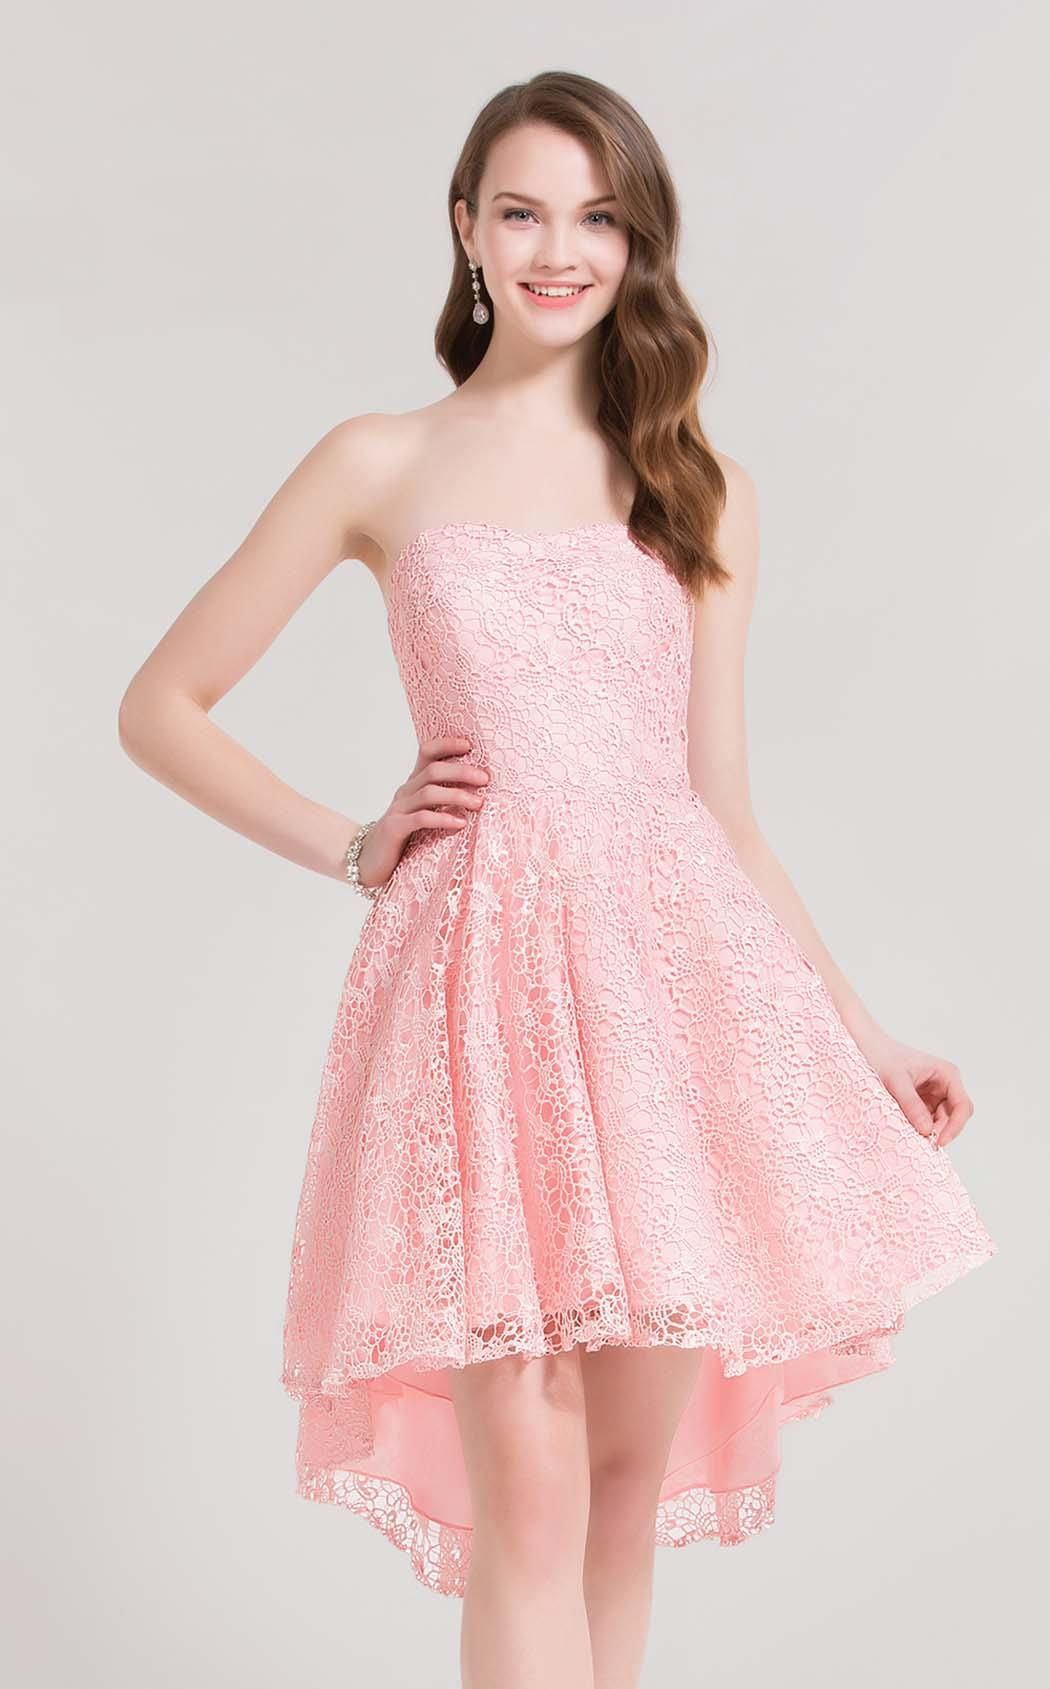 7/7/17 Brand/Designer: Alyce Designs Occasion: Evening Prom Dress ...